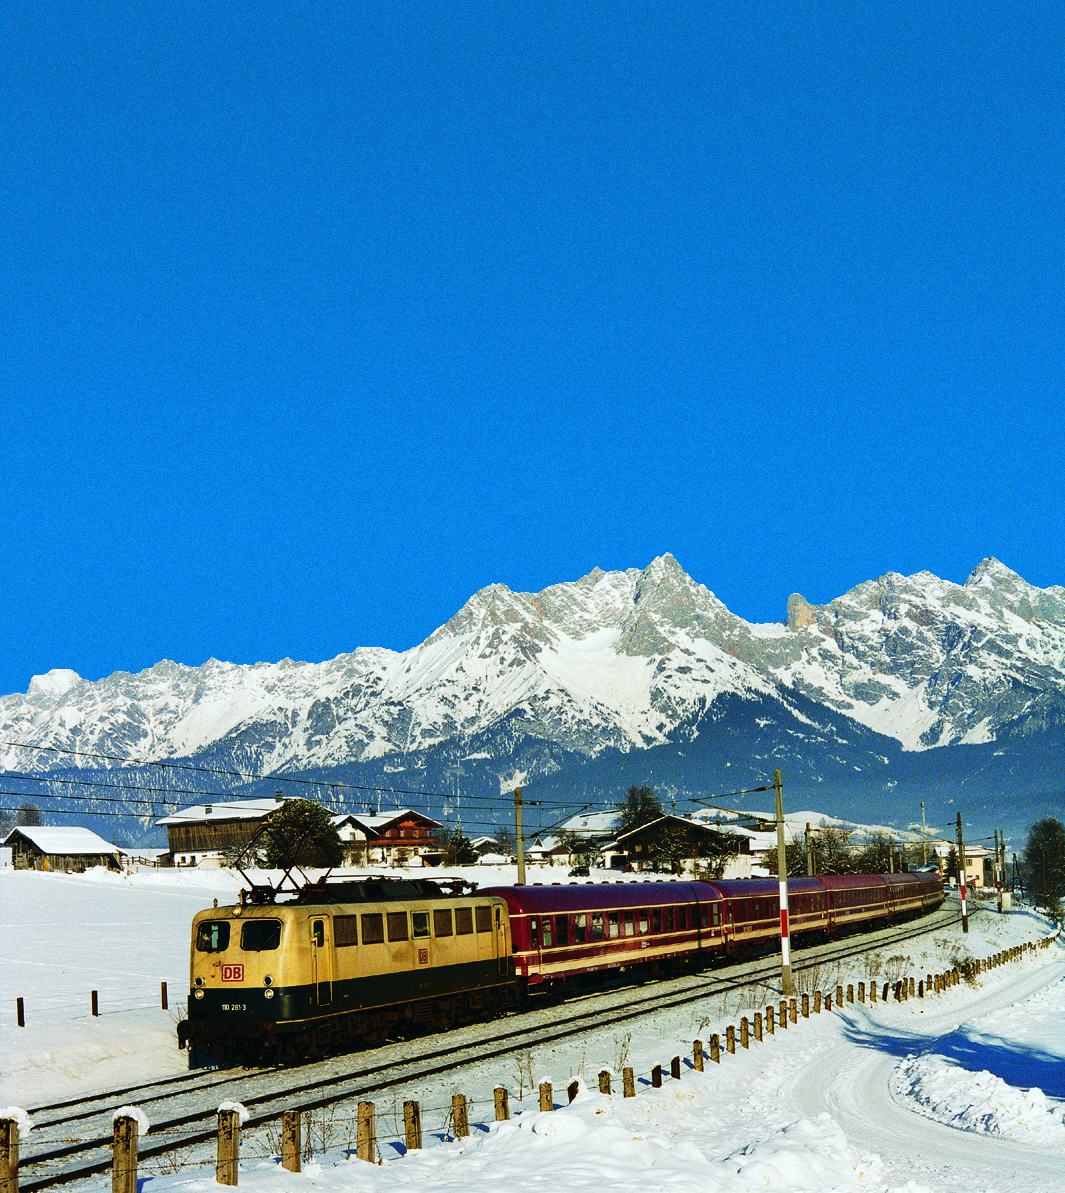 Komend skiseizoen extra treinen naar Oostenrijk: scarlett-reizen.com/?tag=euro-express-treincharter